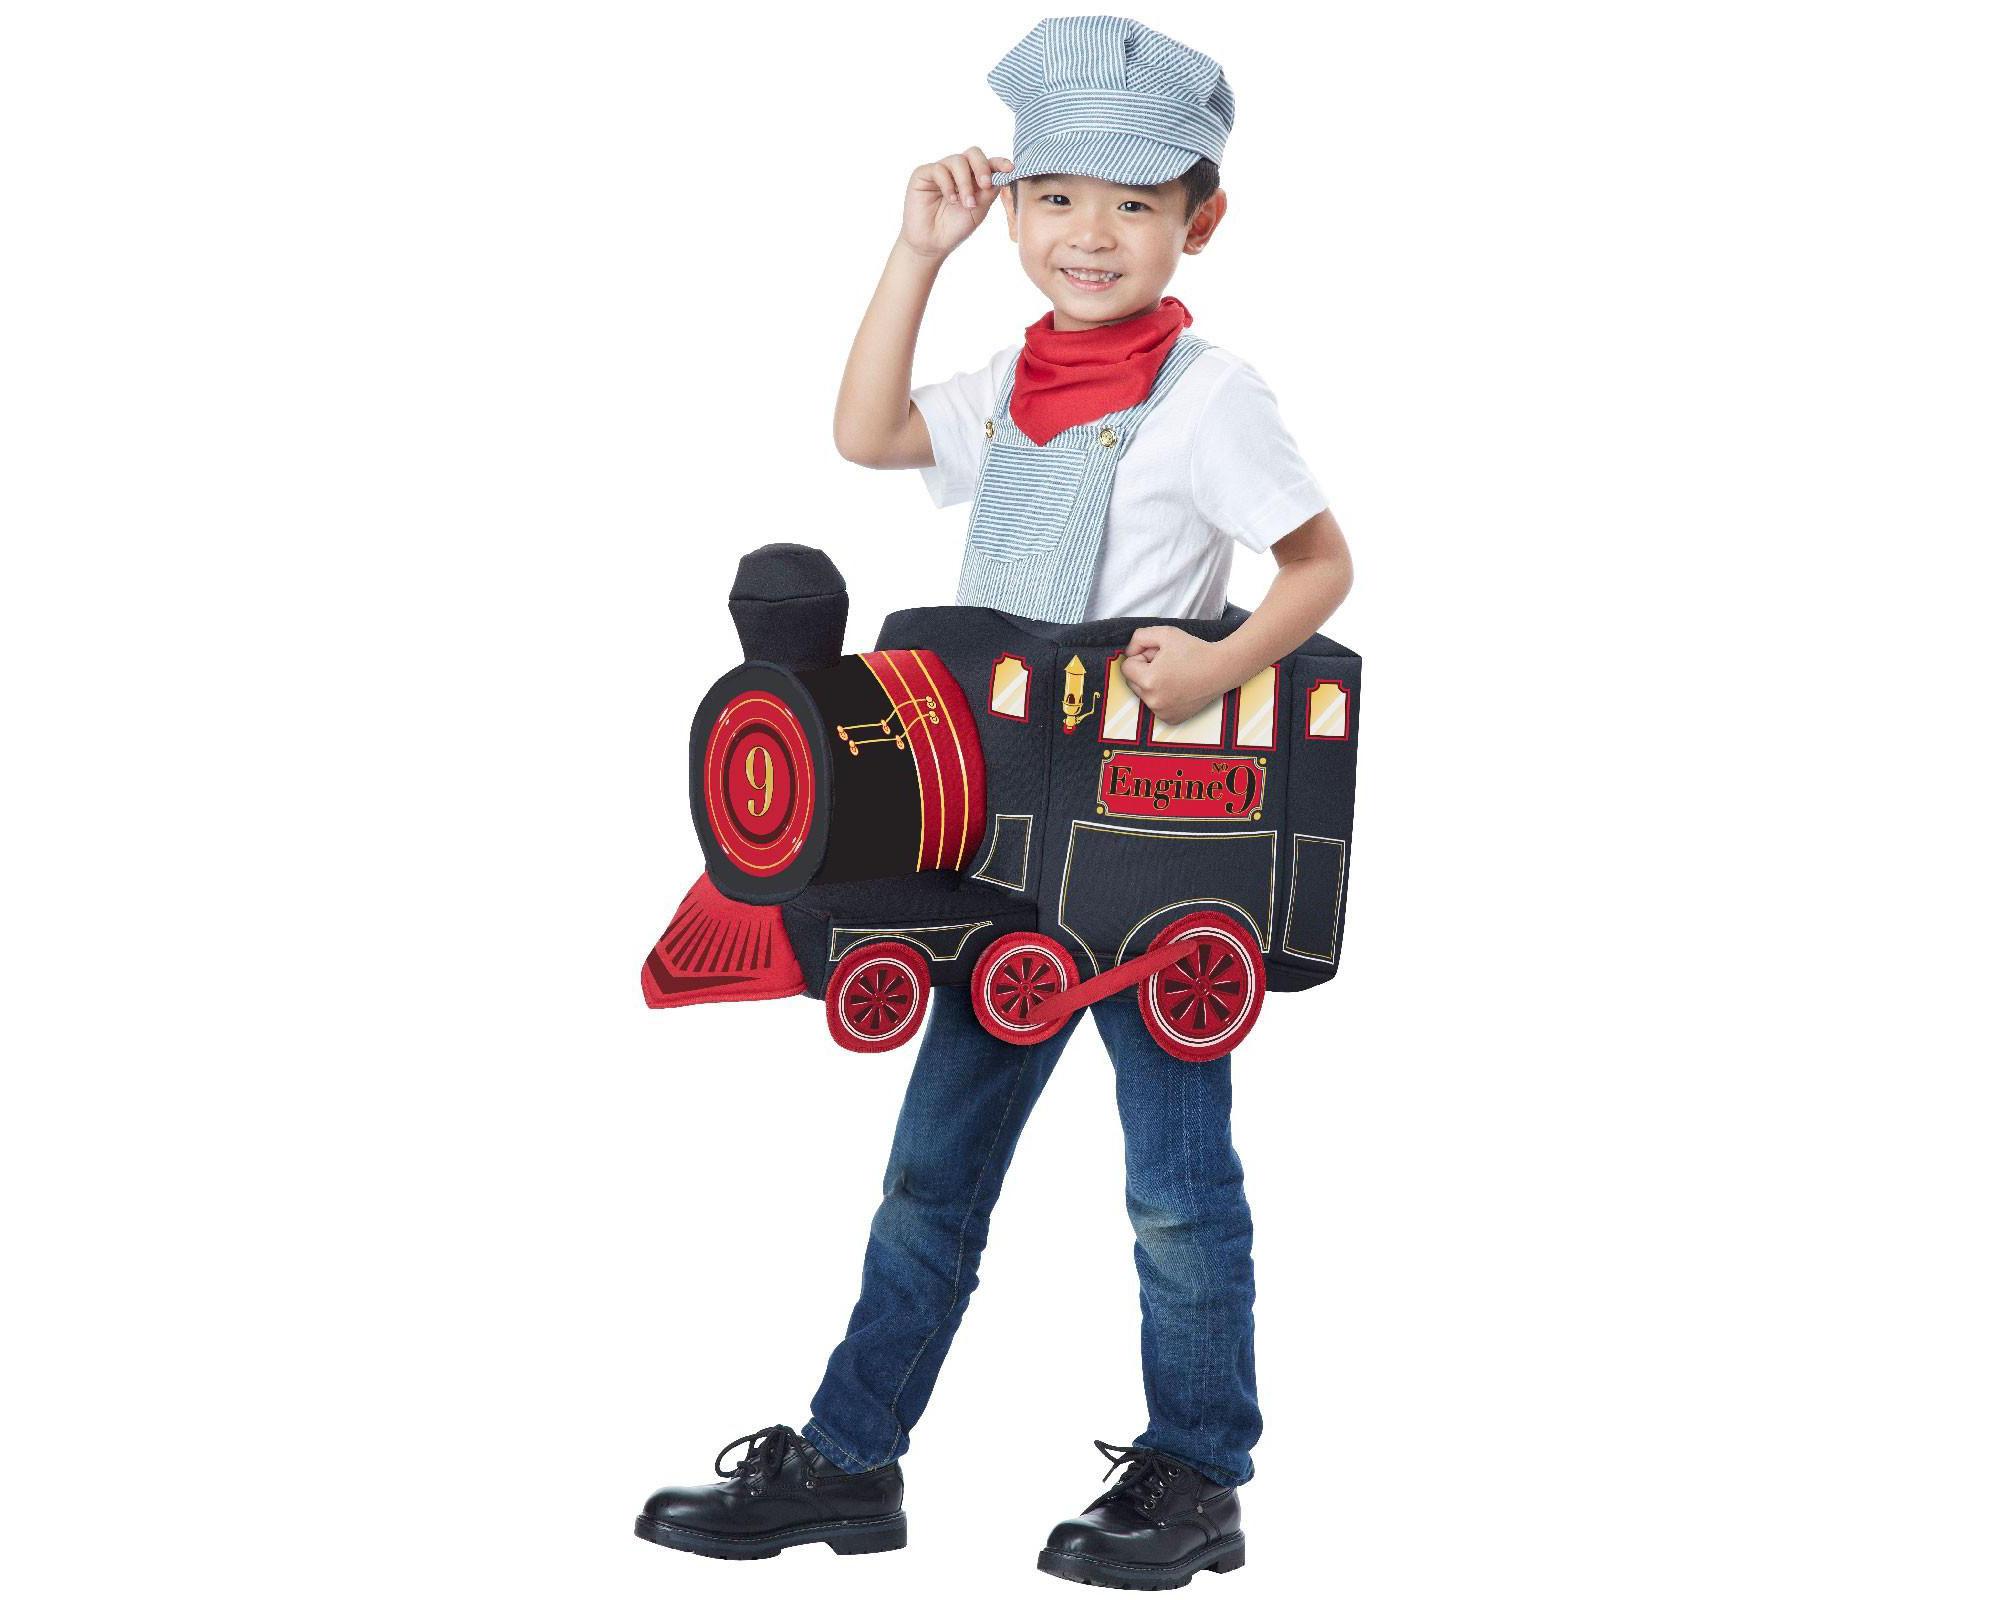 upc 019519115150 - train rider child halloween costume, 1 size